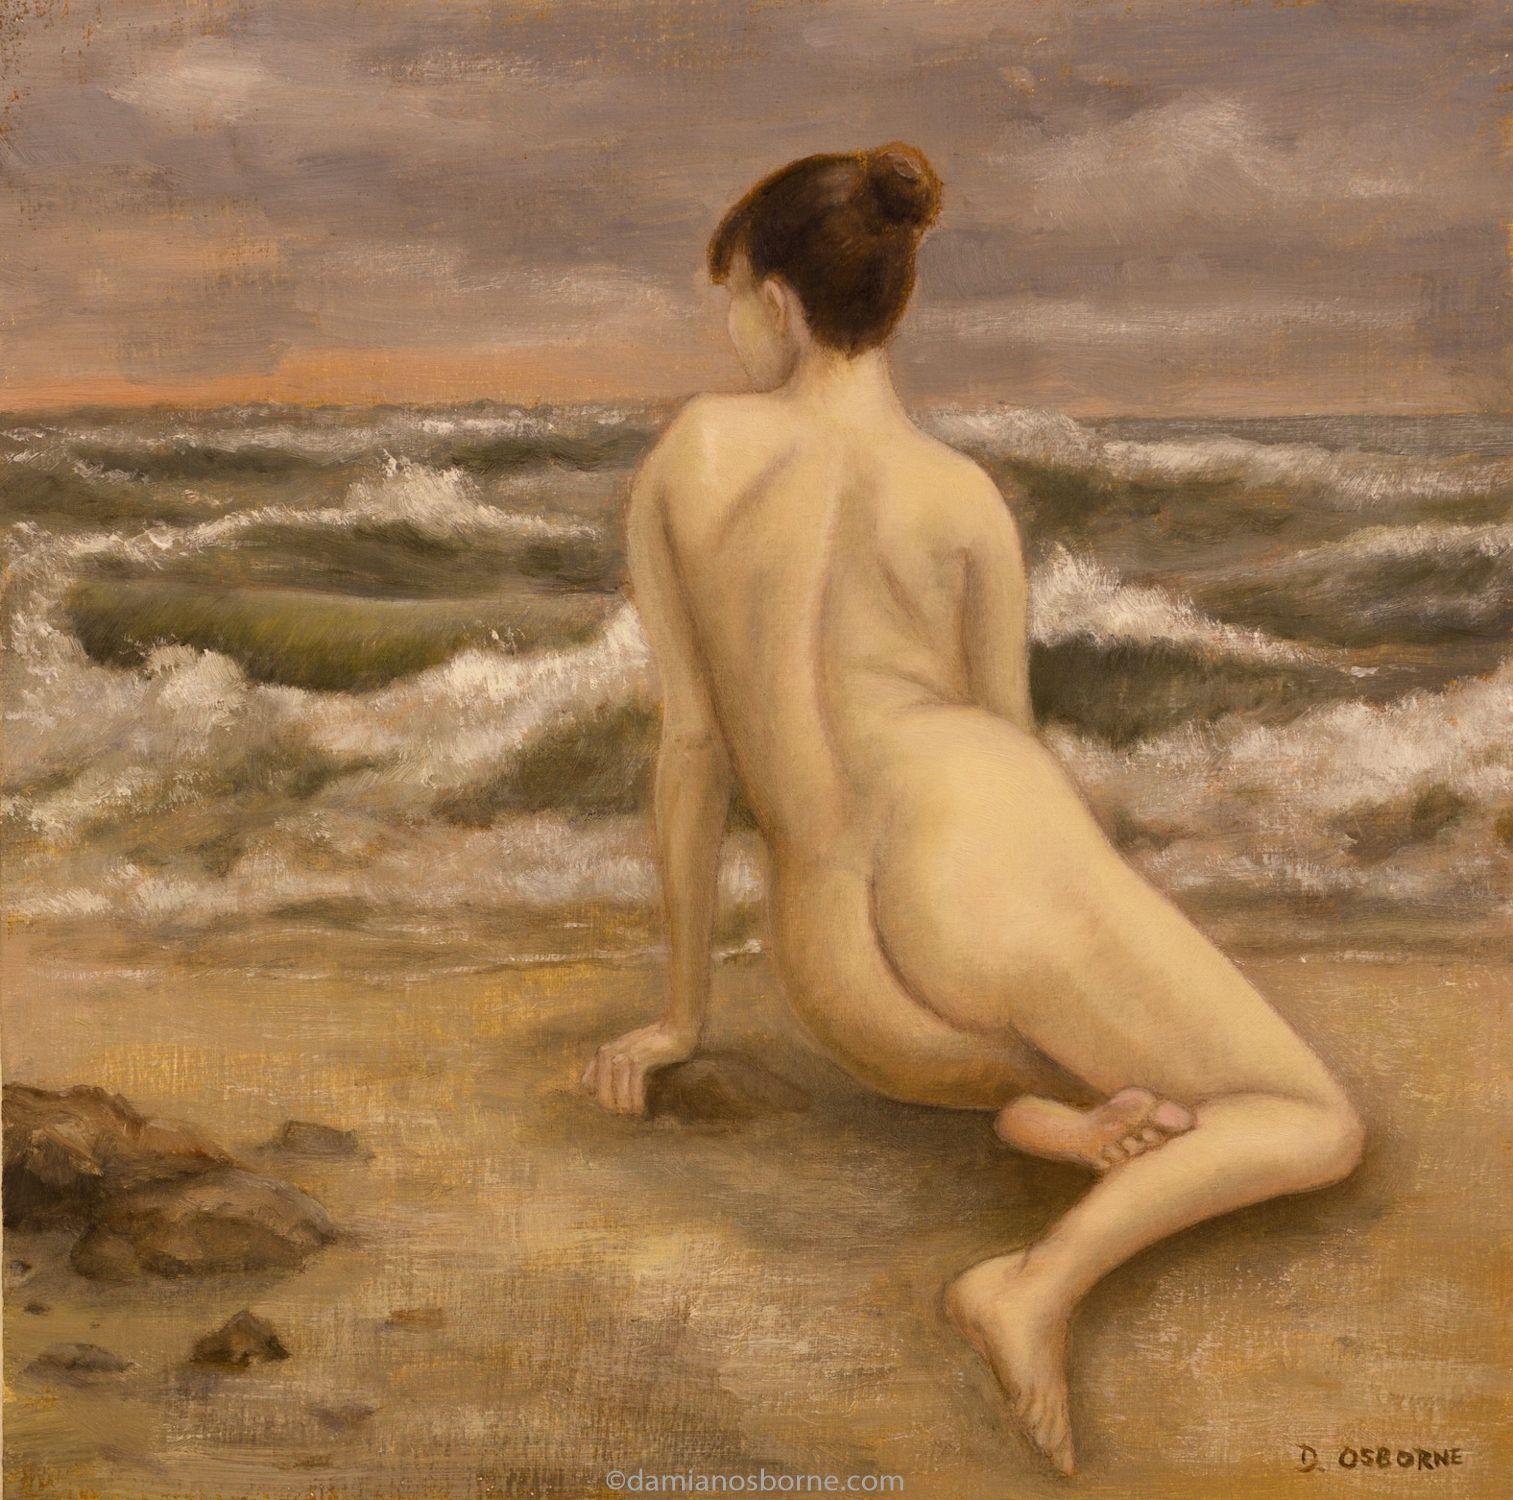 Figurative oil painting by Damian Osborne of a nude woman lying near waves crashing